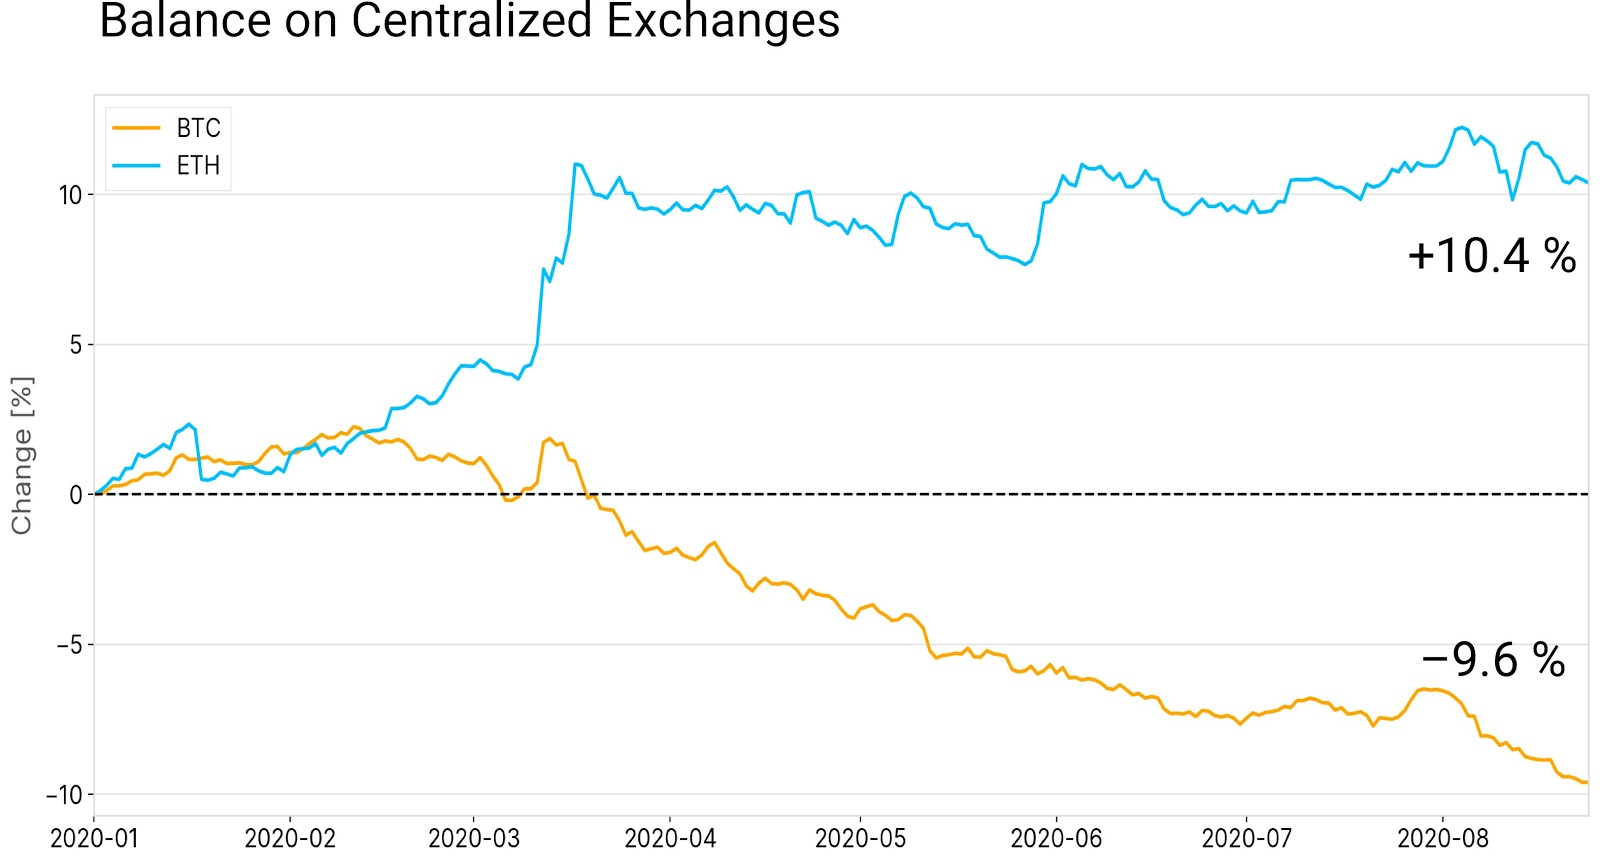 Saldo Bitcoin dan Ether di bursa. Sumber: Glassnode